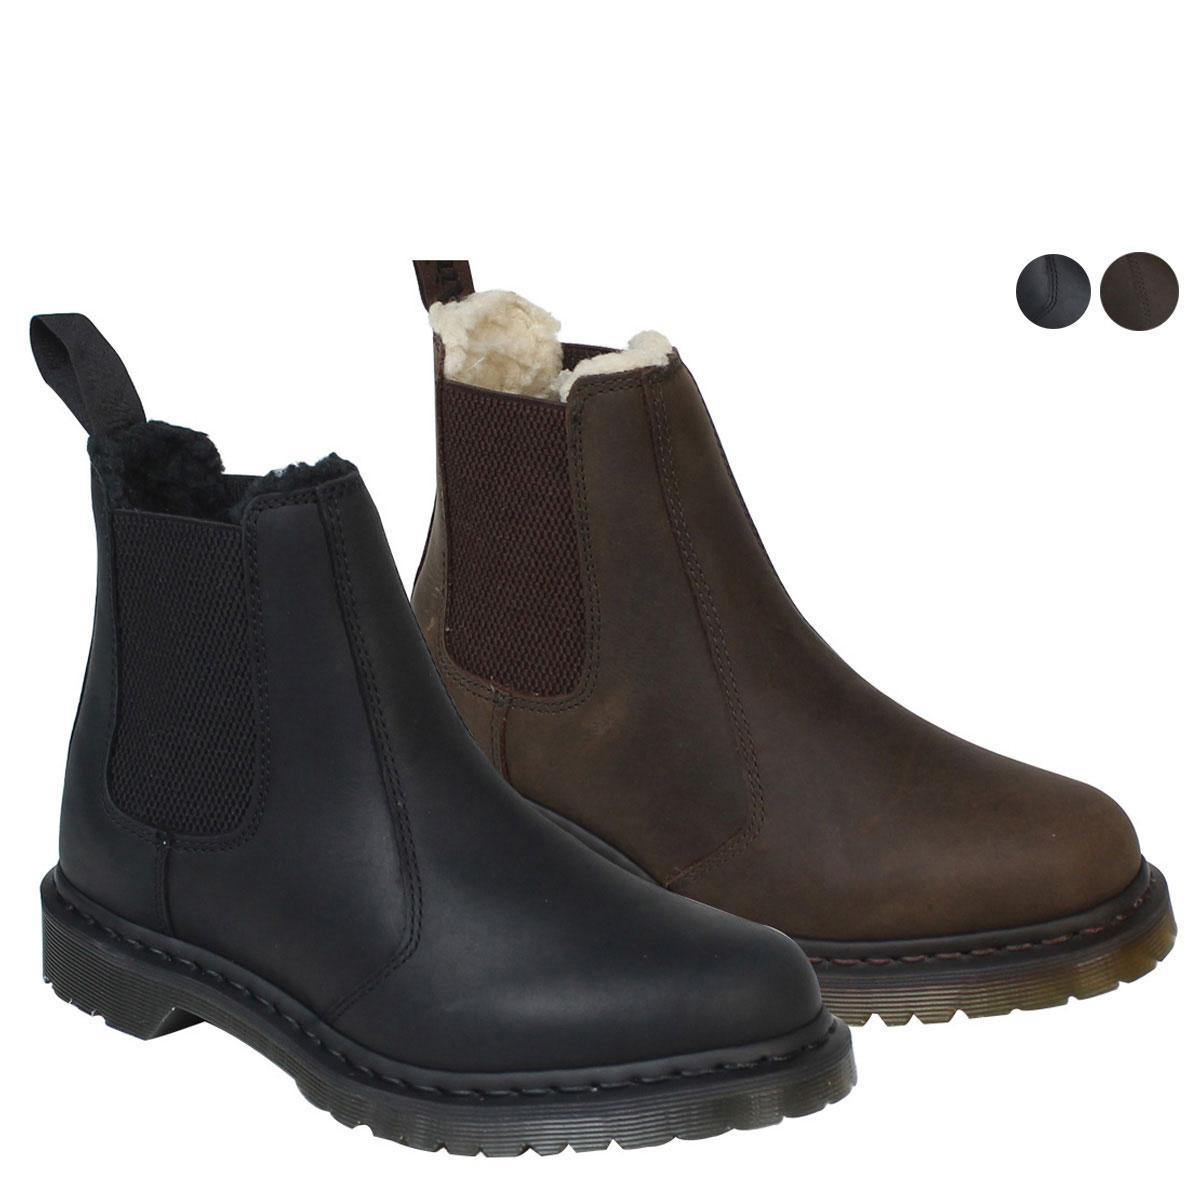 Whats Up Sports Dr Martens Martens Couleur Chelsea Boots